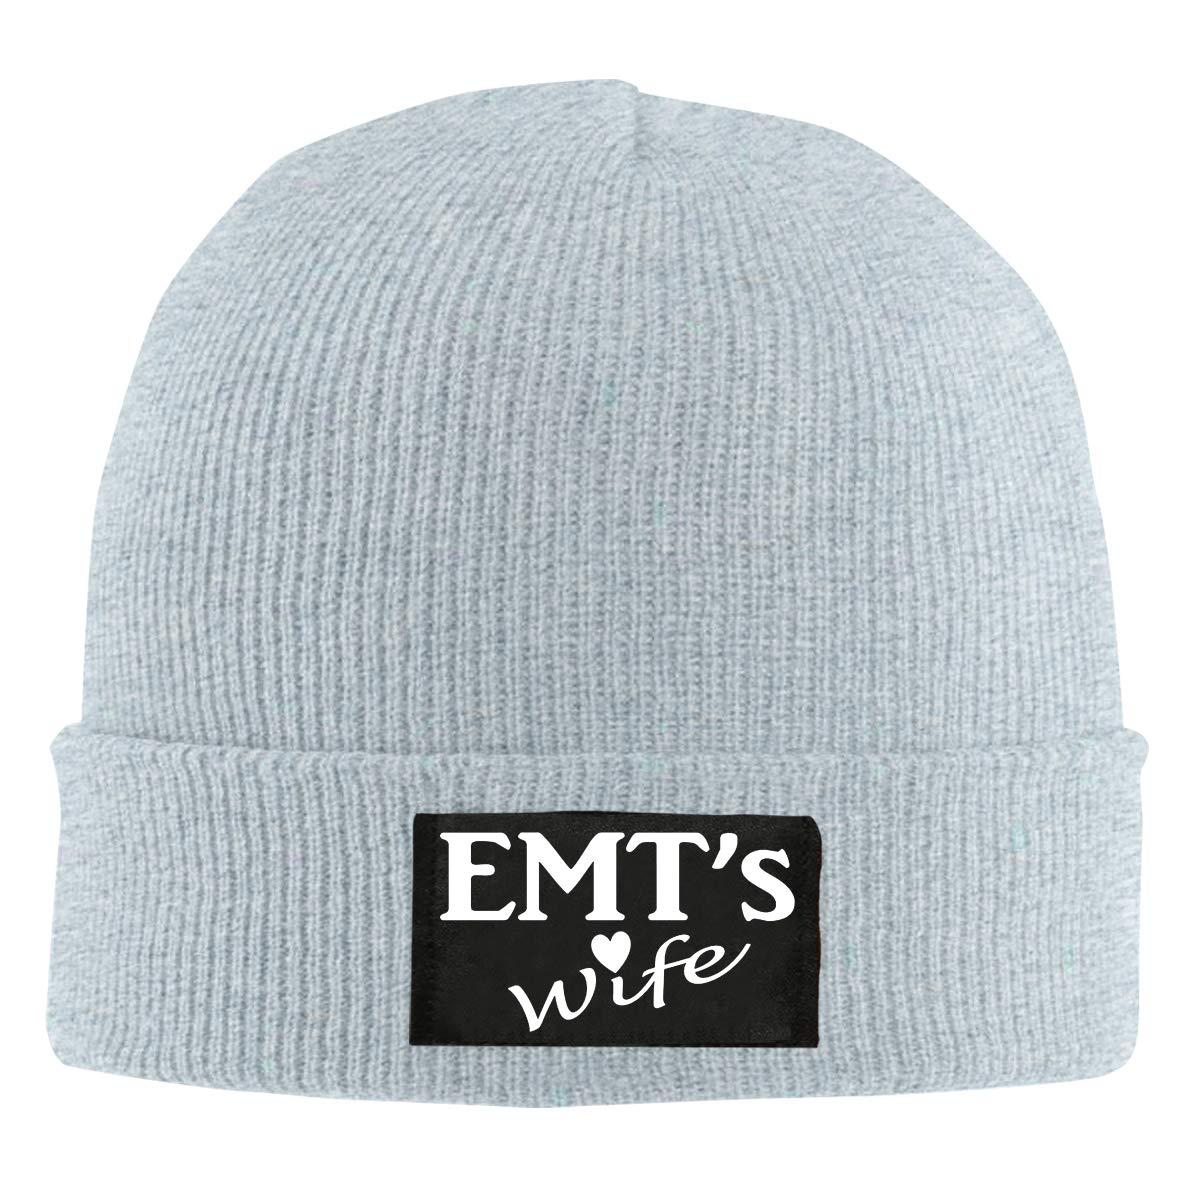 EMTs Wife Unisex Warm Winter Hat Knit Beanie Skull Cap Cuff Beanie Hat Winter Hats